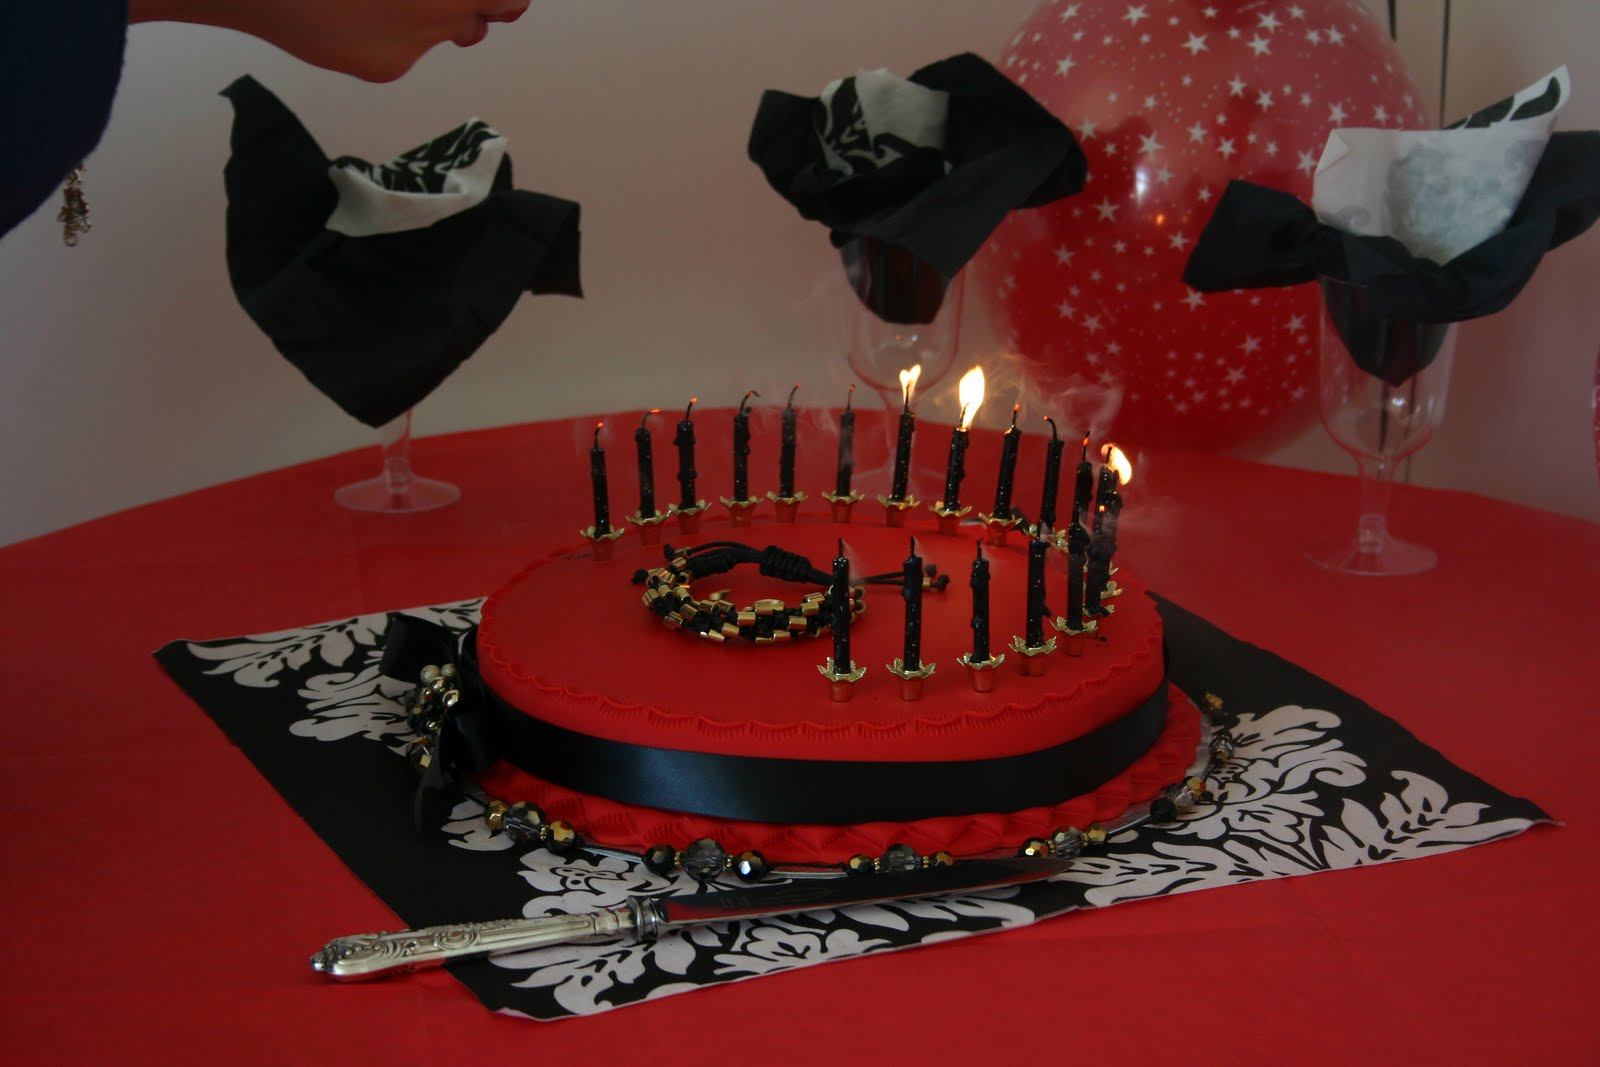 Kendals Sasha Brood One Of My Nieces 19th Birthday Cake